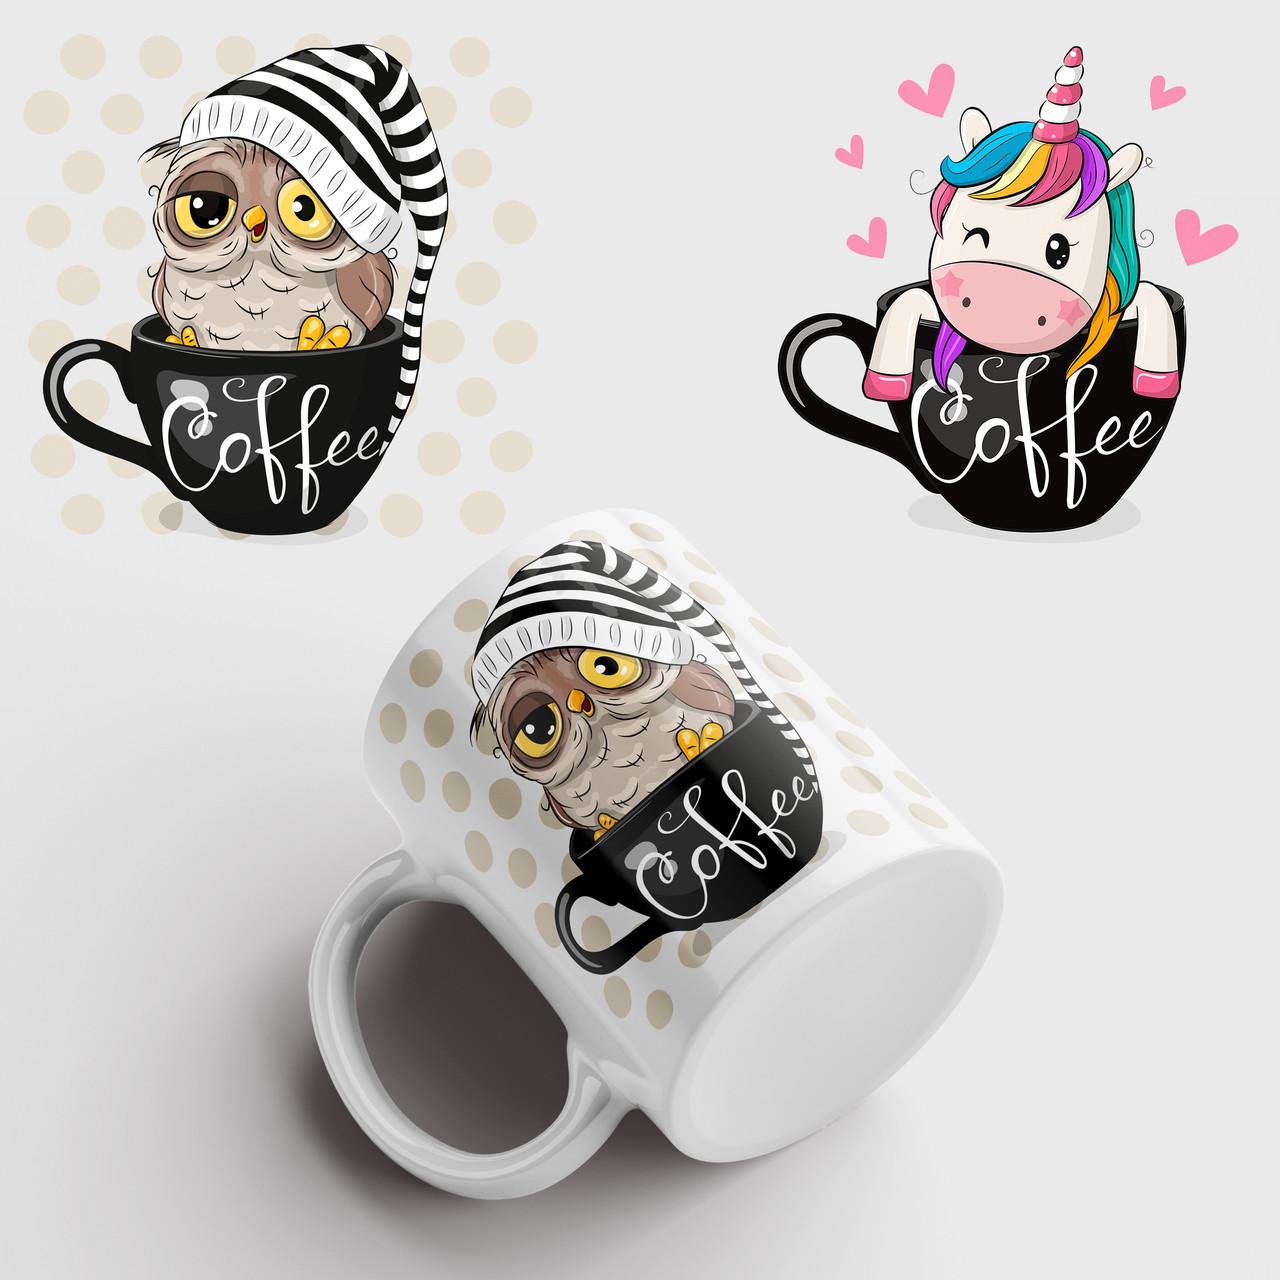 Кружка с принтом Единорог и сова Coffee. Чашка с фото